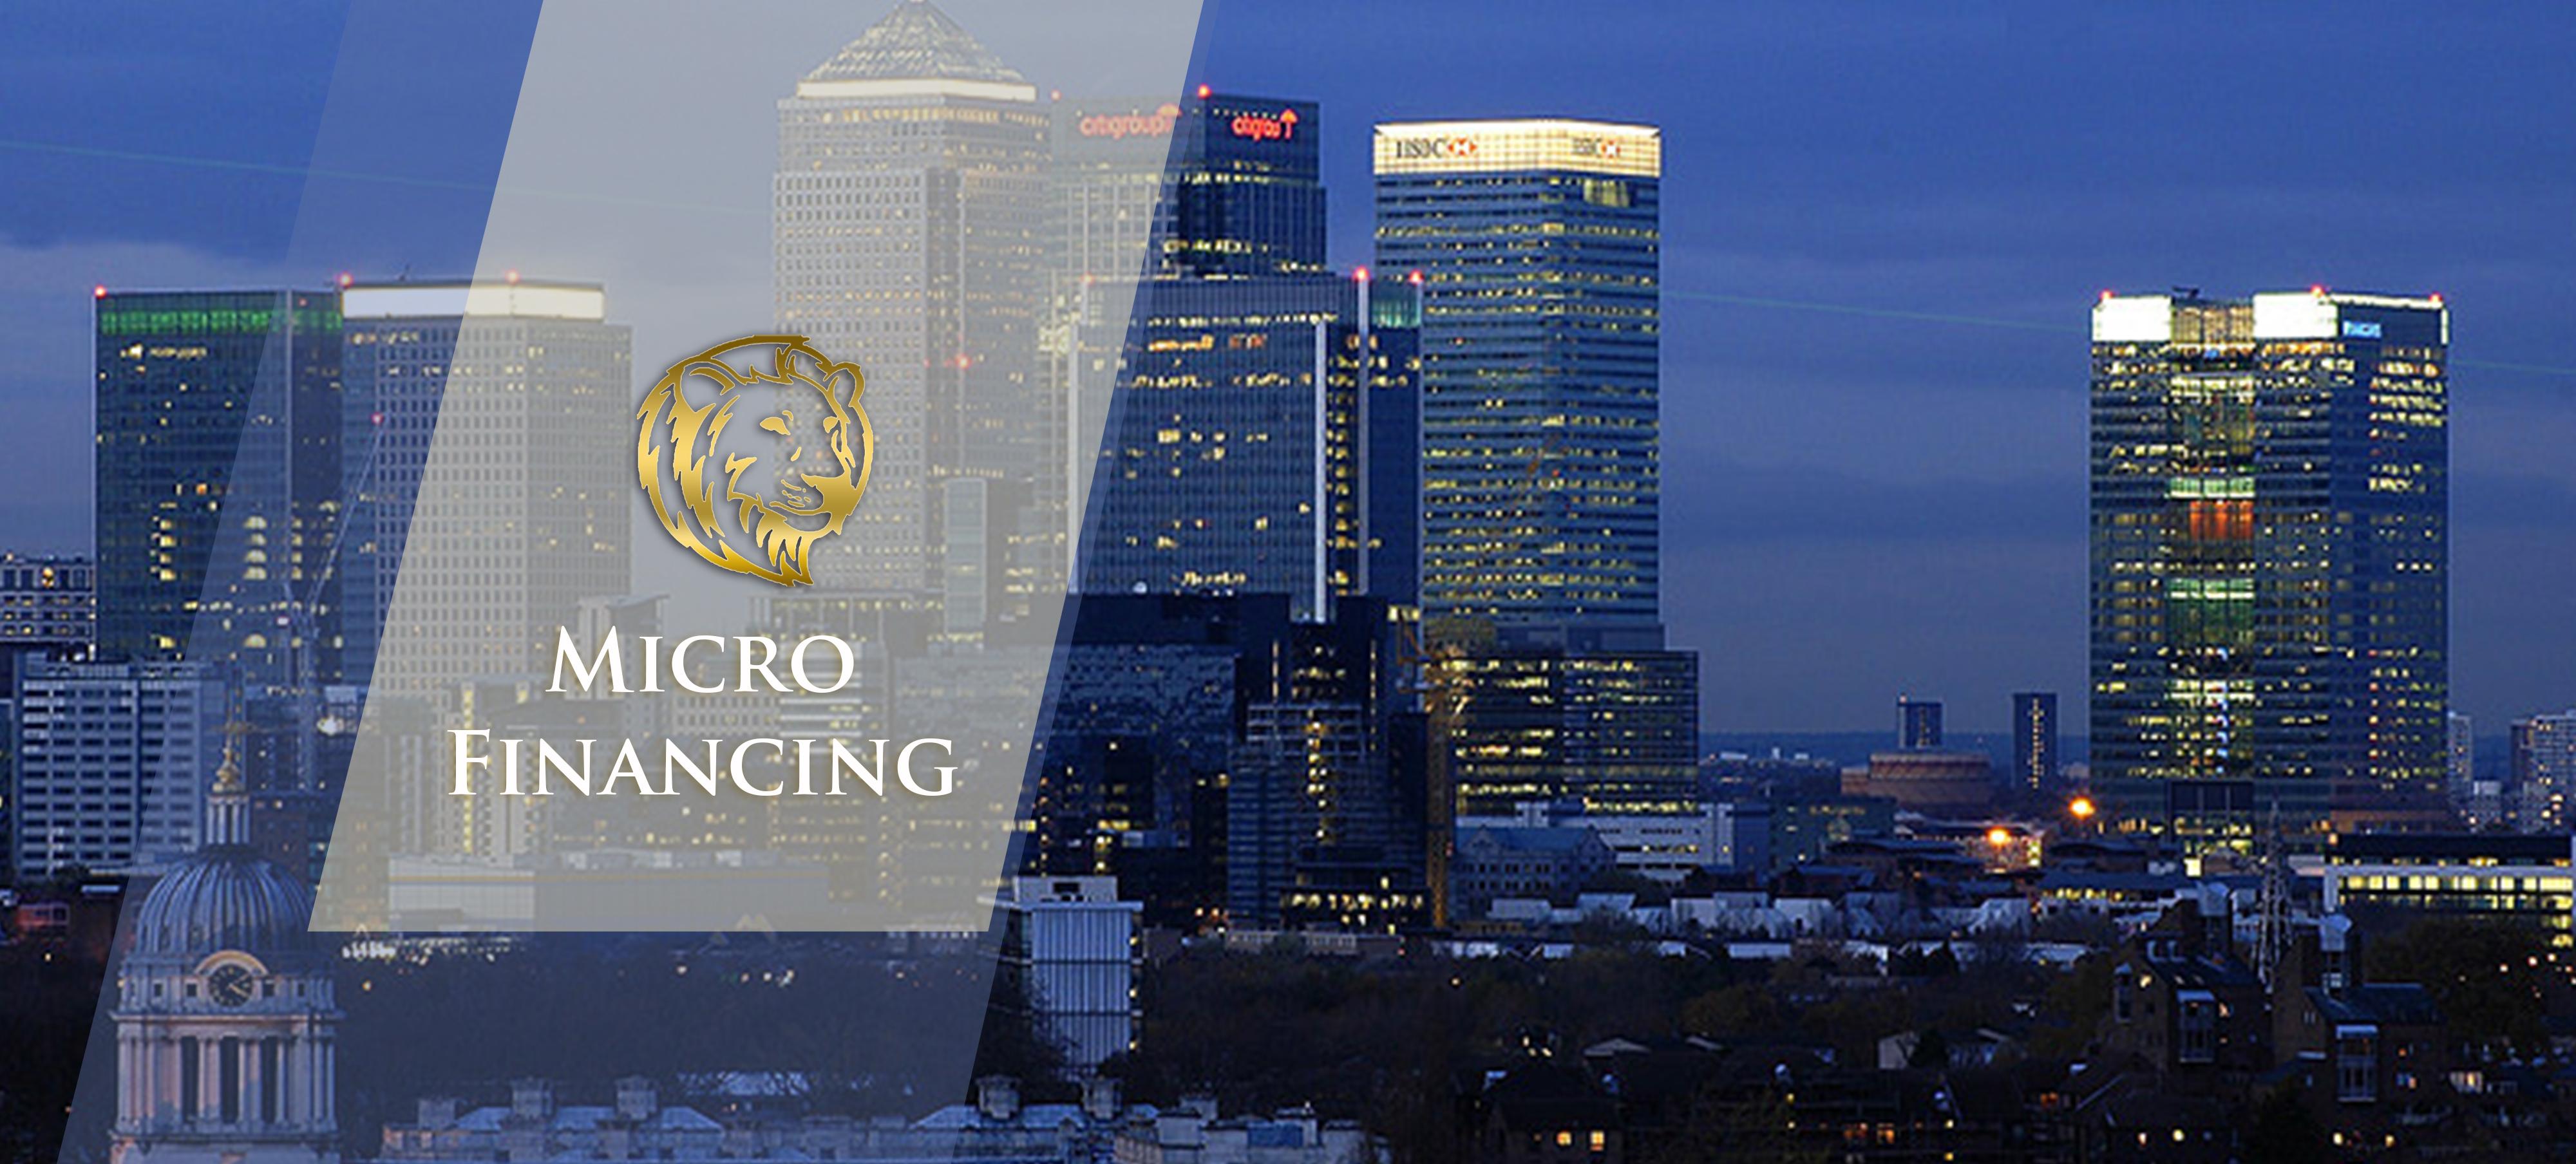 mircorfinancing slide